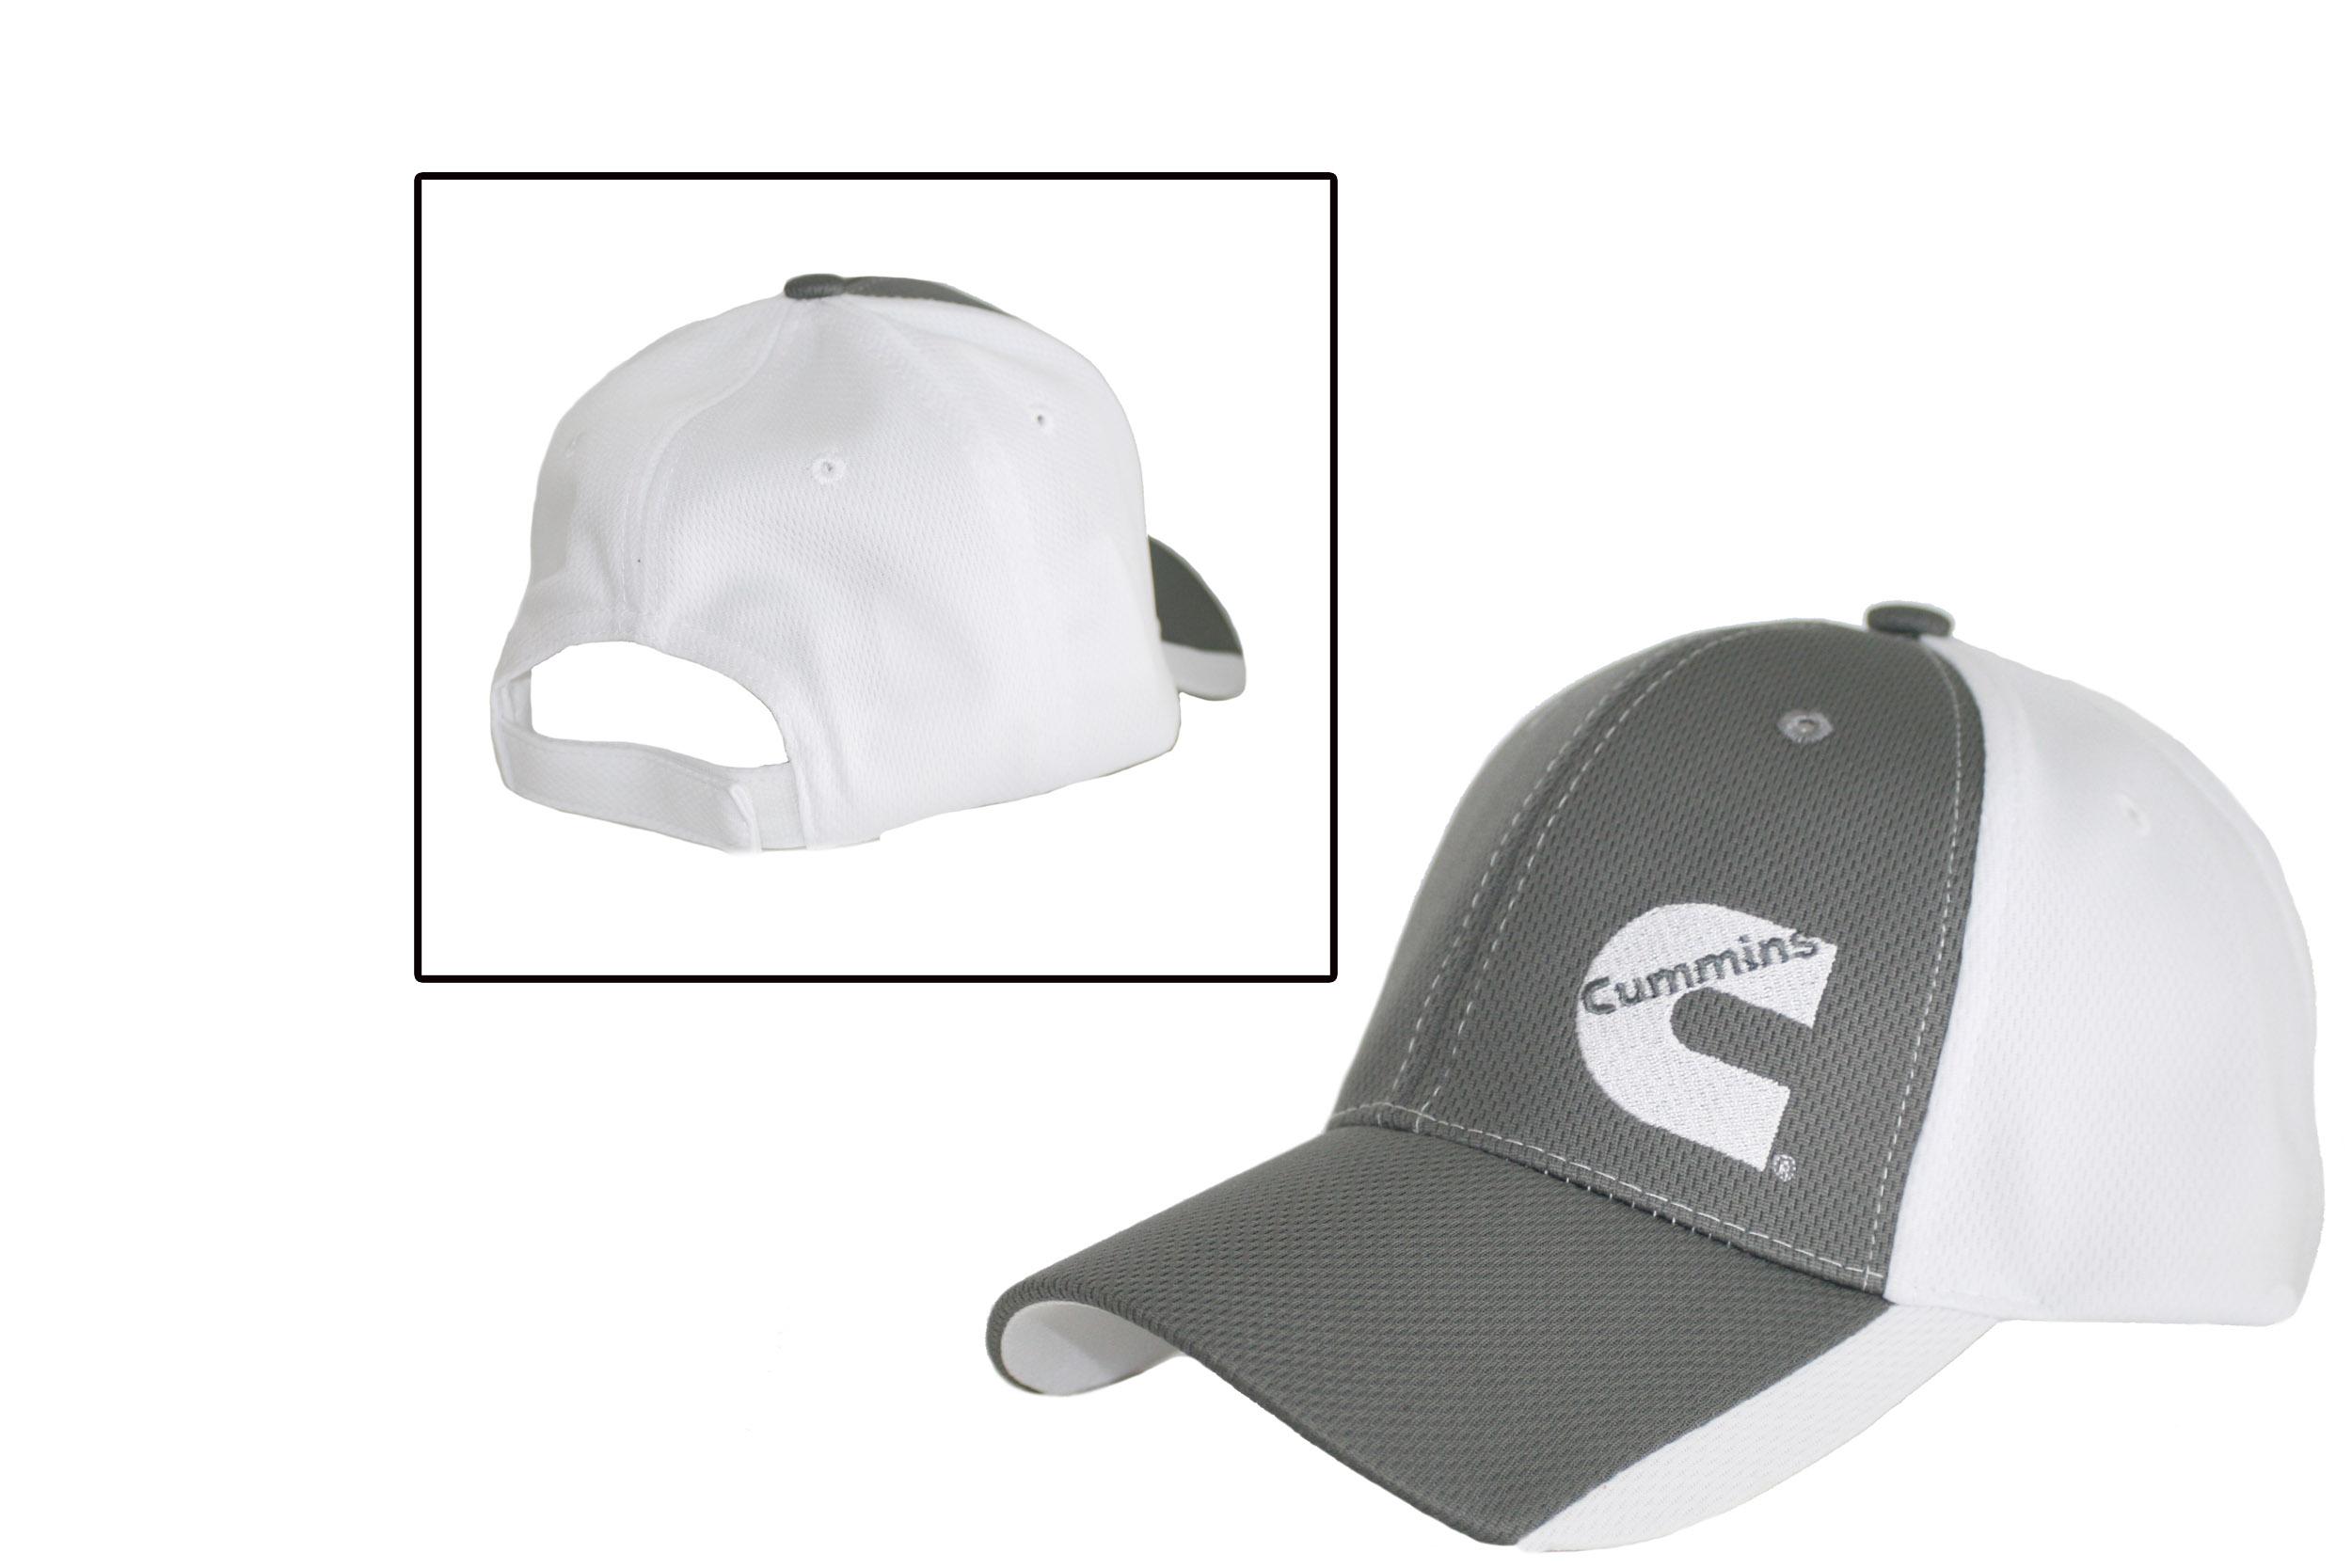 Cummins Diesel Gray   White Polymesh Hat Cap - Cummins Merchandise - Cummins  Diesel Gray   White Polymesh Hat Caps fd22386762ff